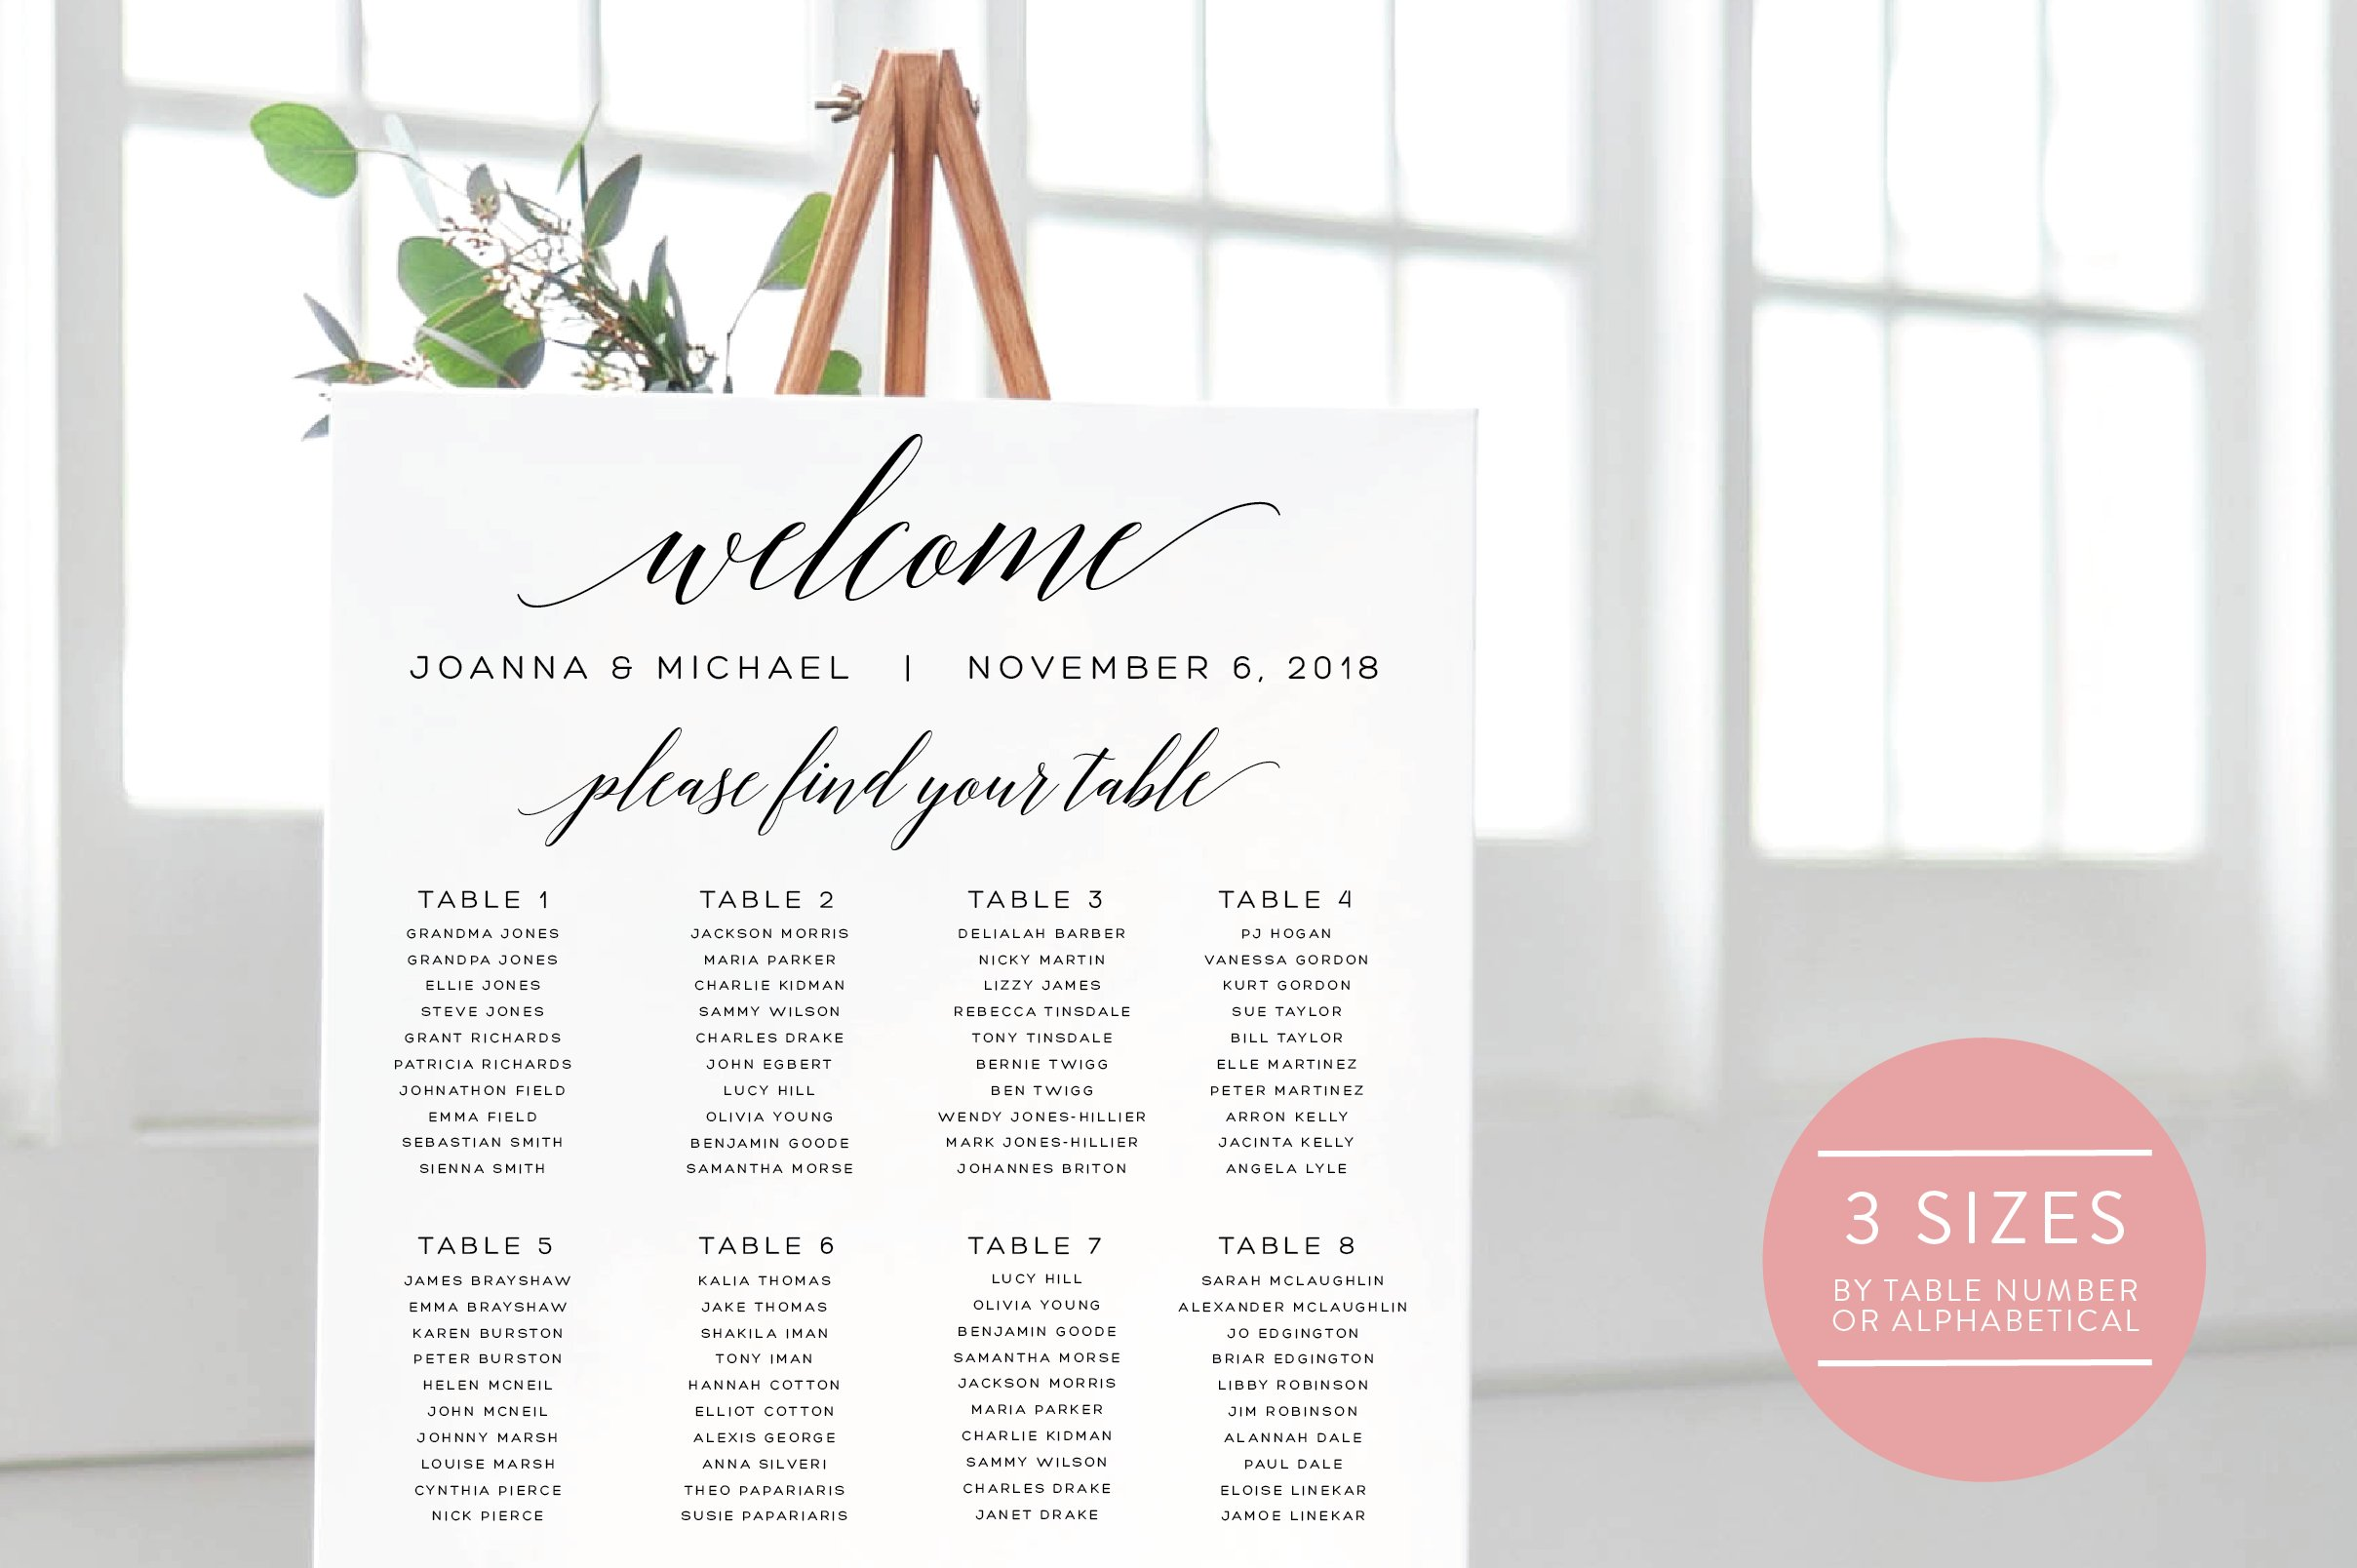 Wedding Seating Chart Editable Pdf Templates Creative Market